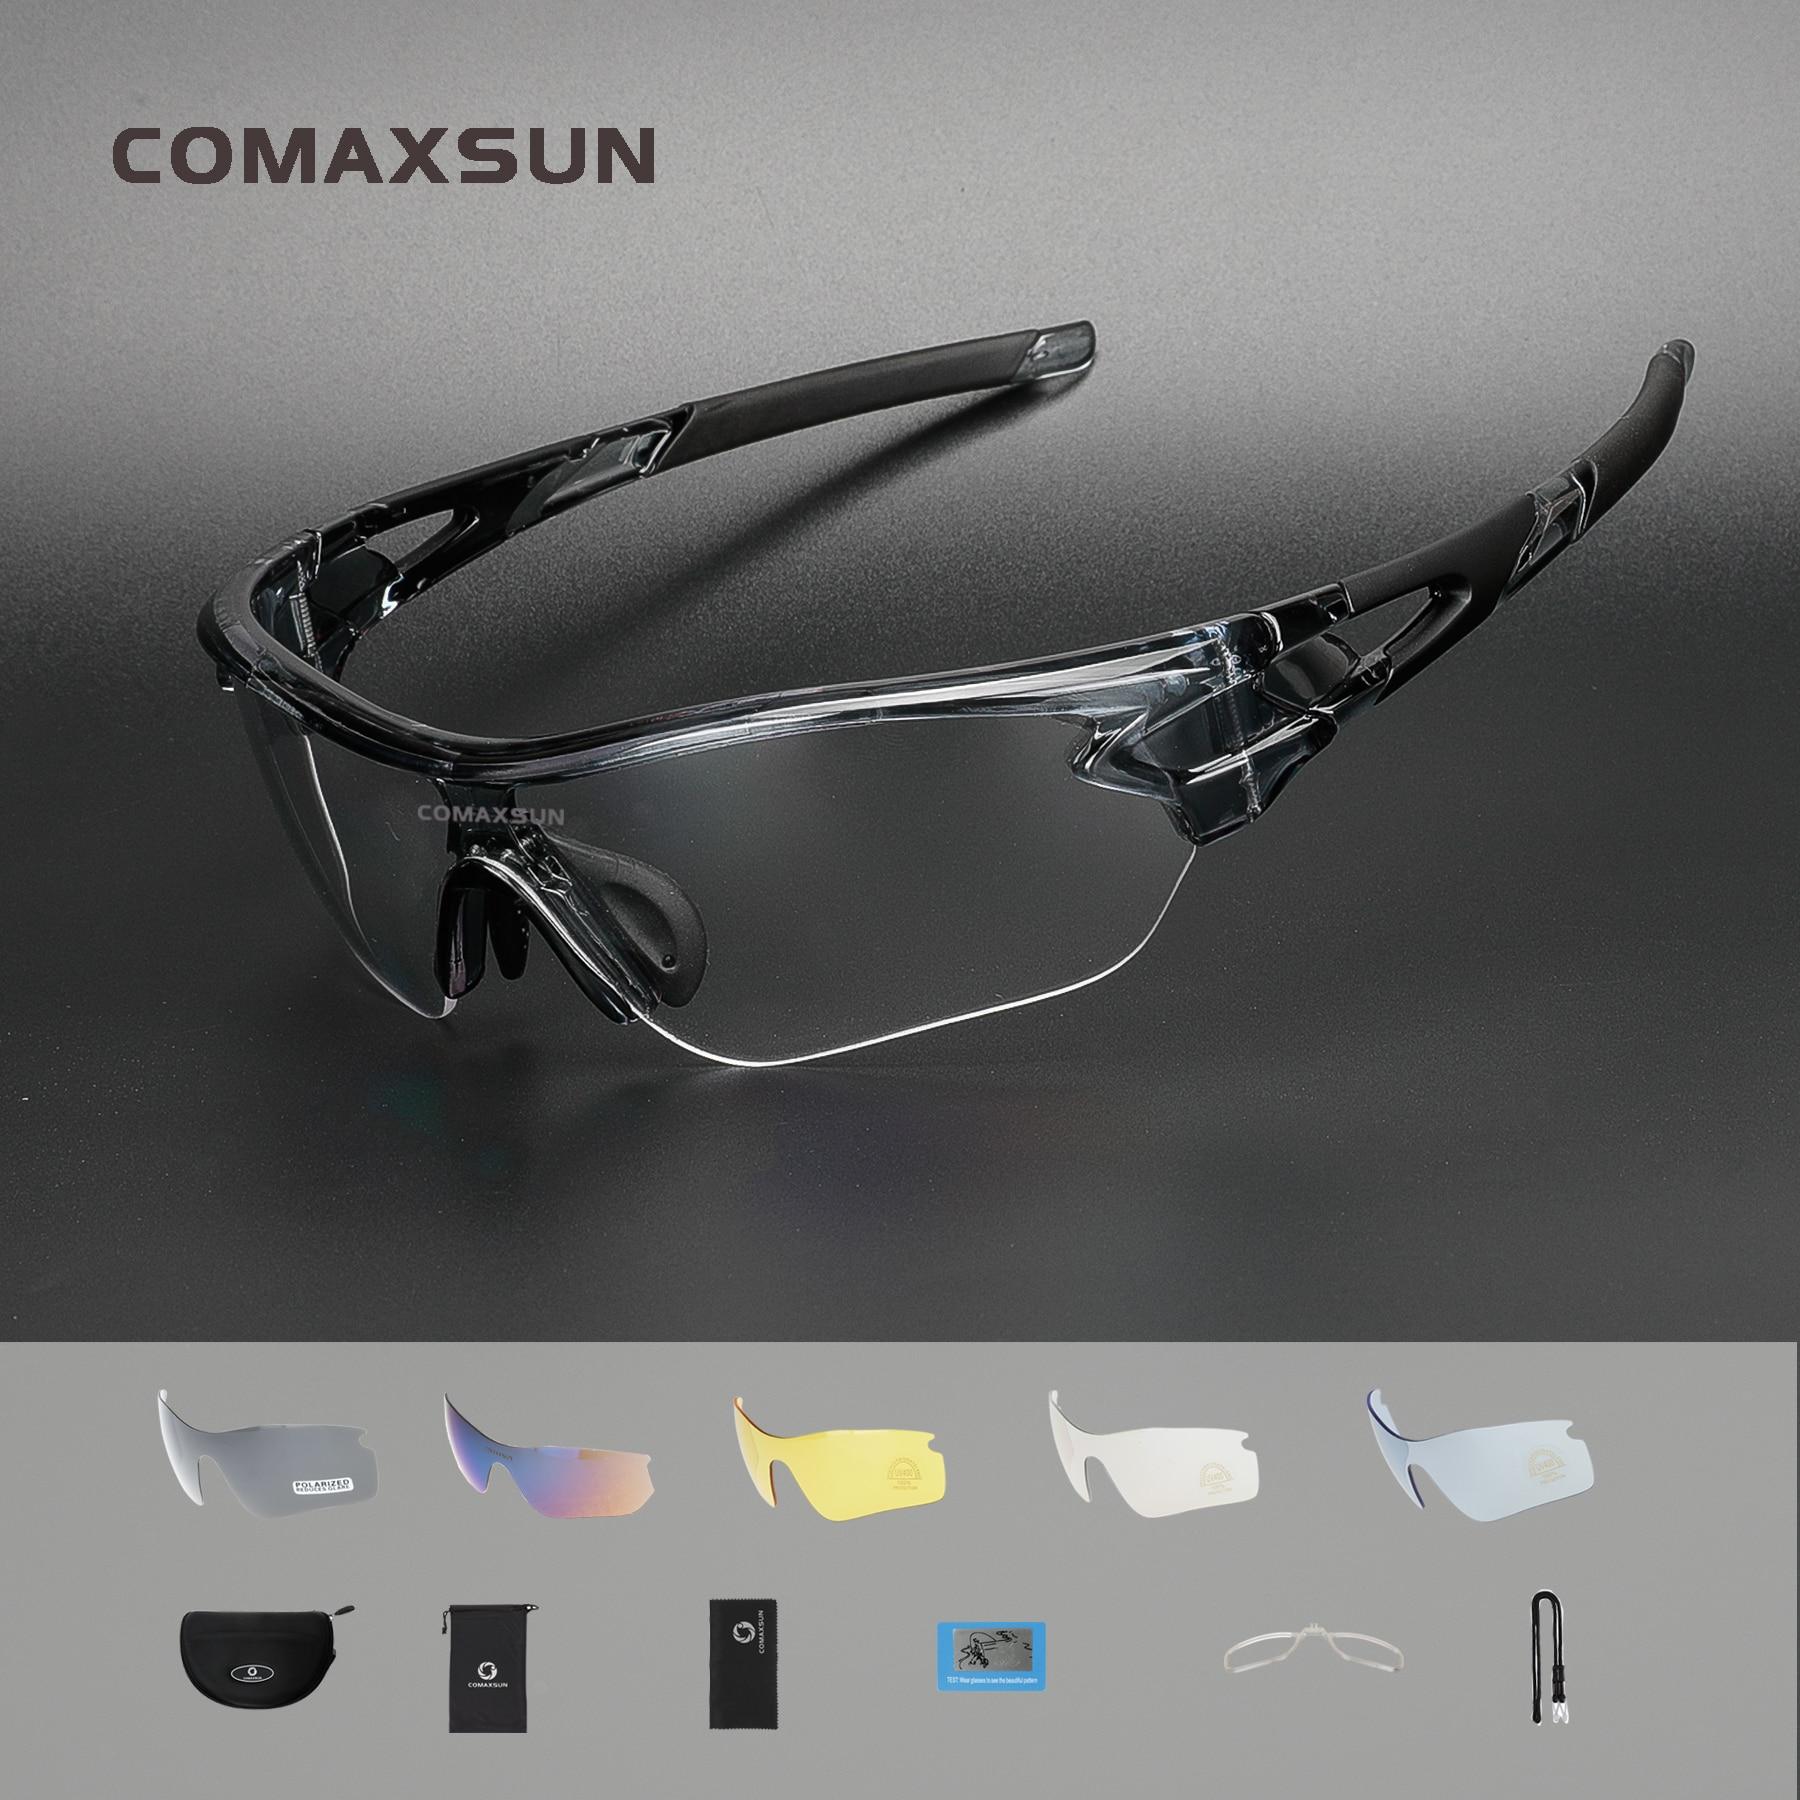 COMAXSUN Professional Polarized Cycling Glasses Bike MTB Goggles Fishing Outdoor Sports TR90 Sunglasses UV 400 5 Lens